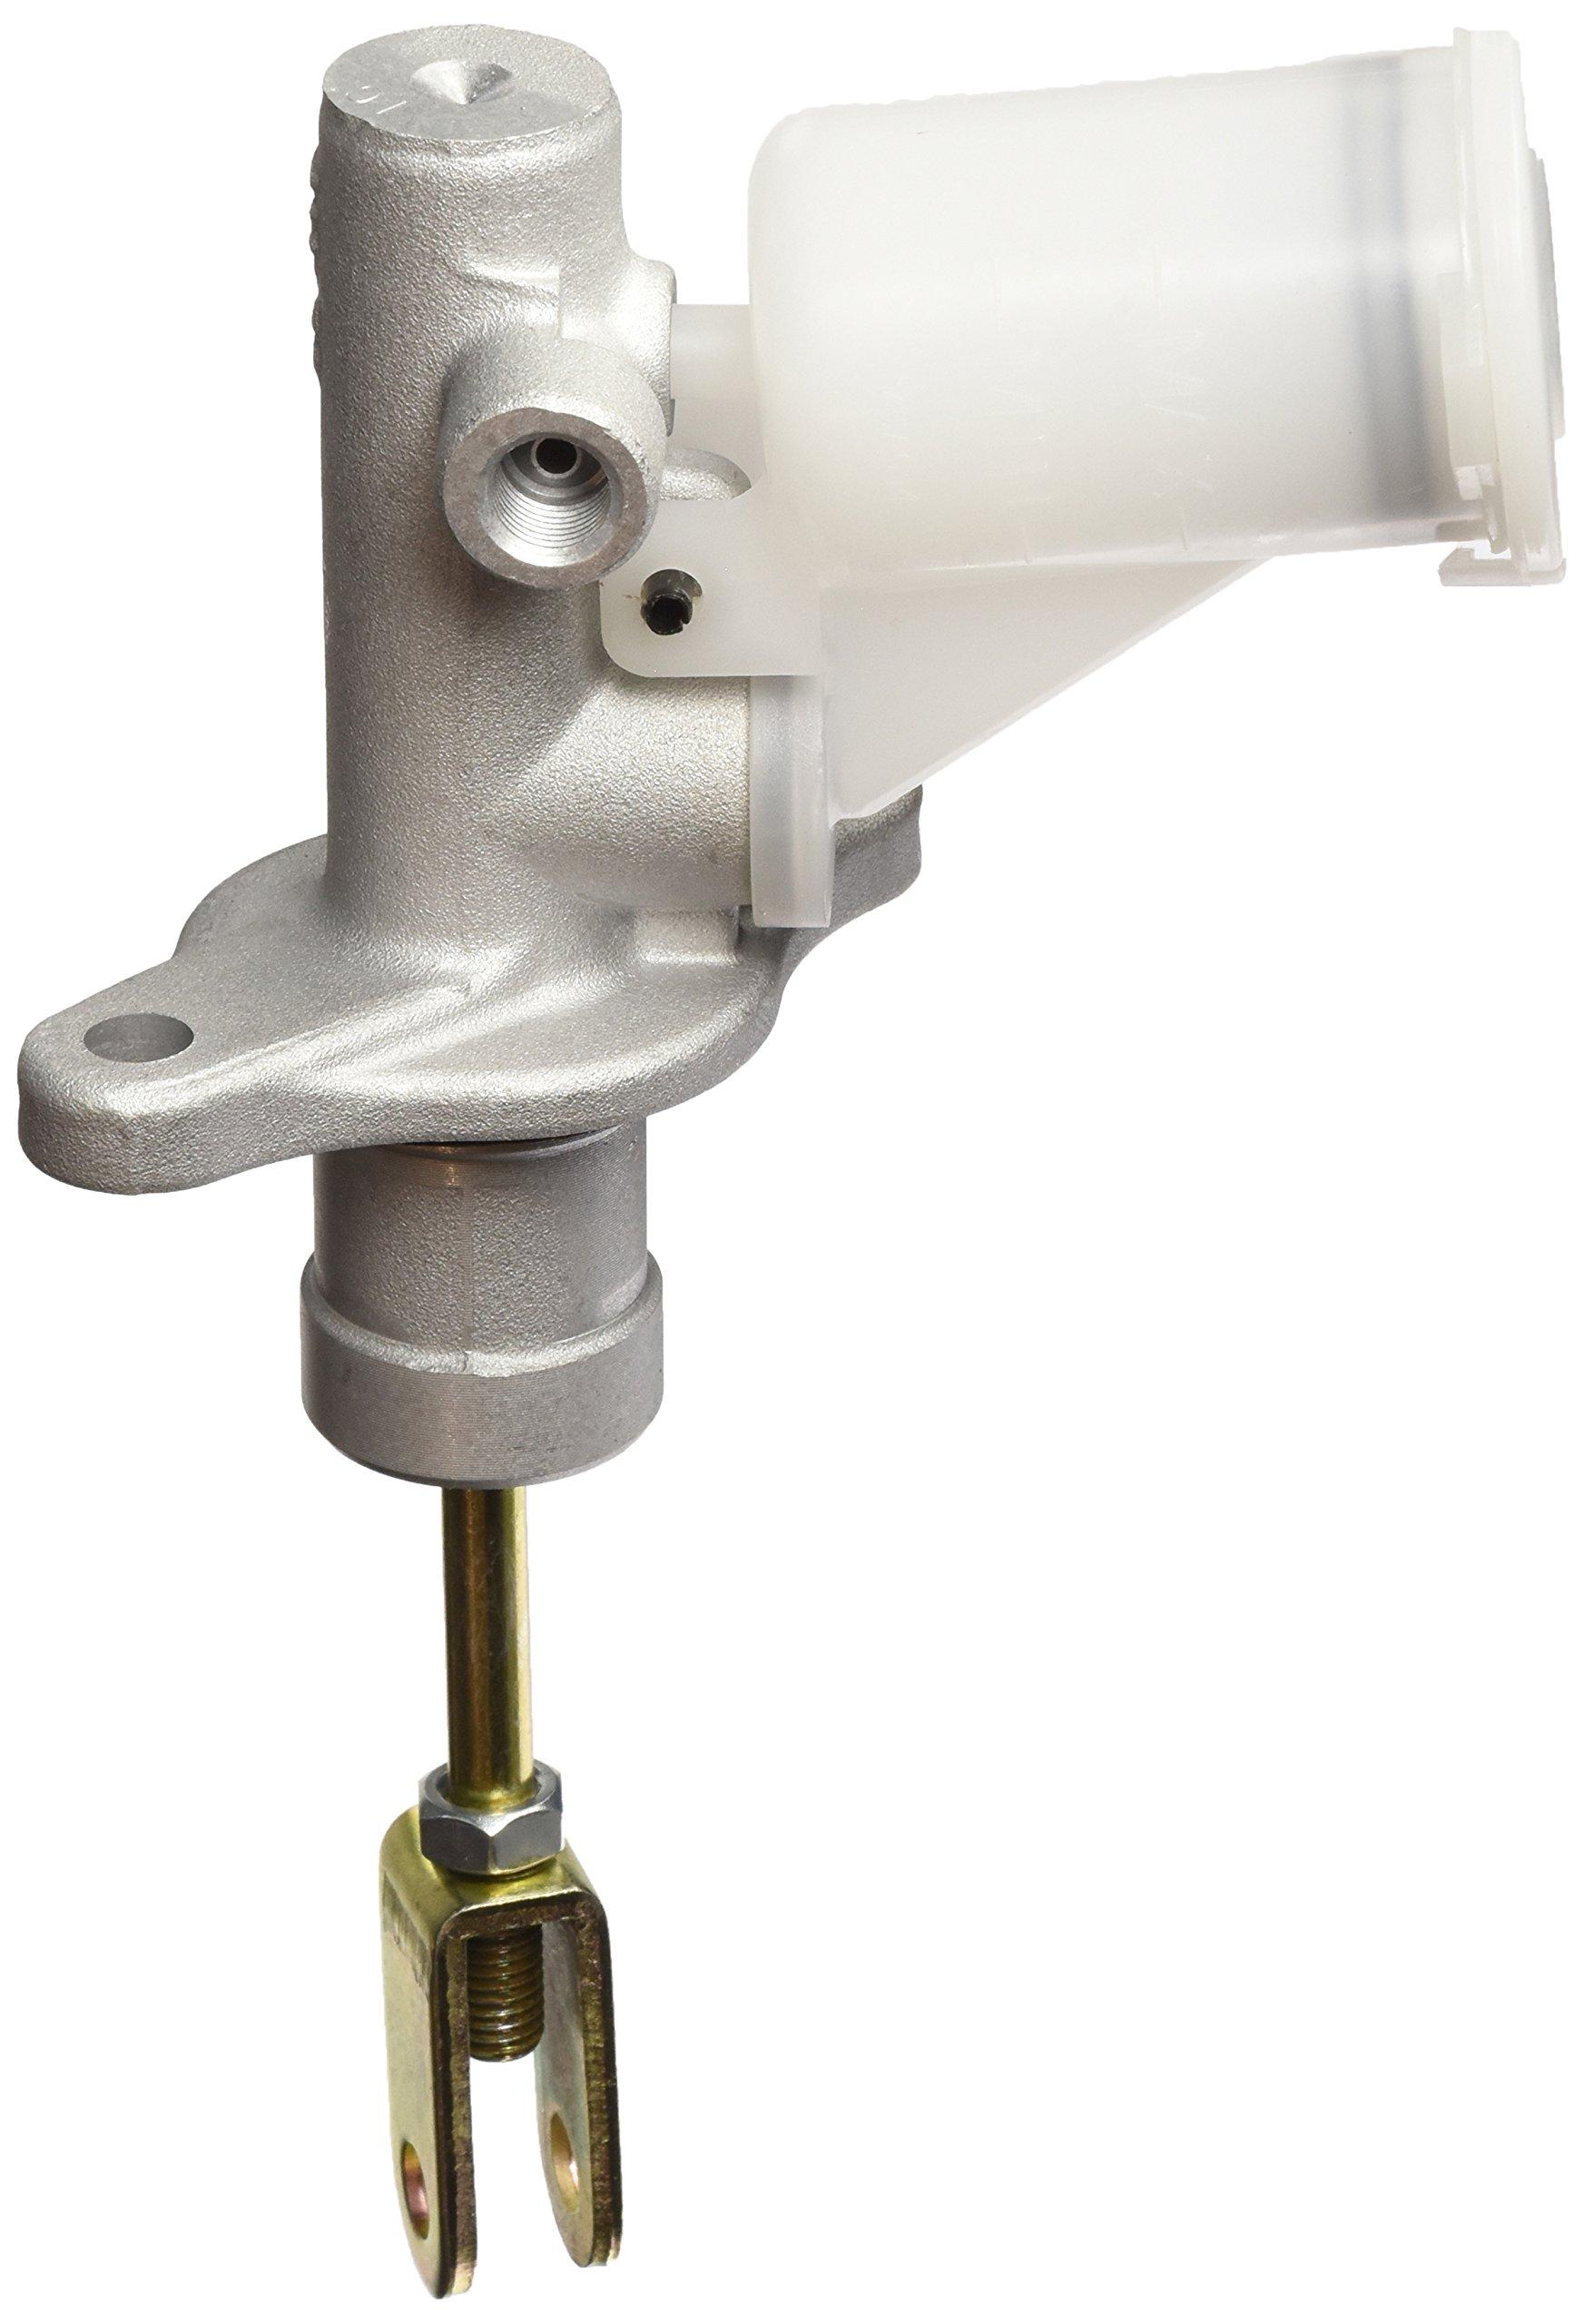 New Generation M1622 Premium Hydraulic Geo Toyota Clutch Master Cylinder